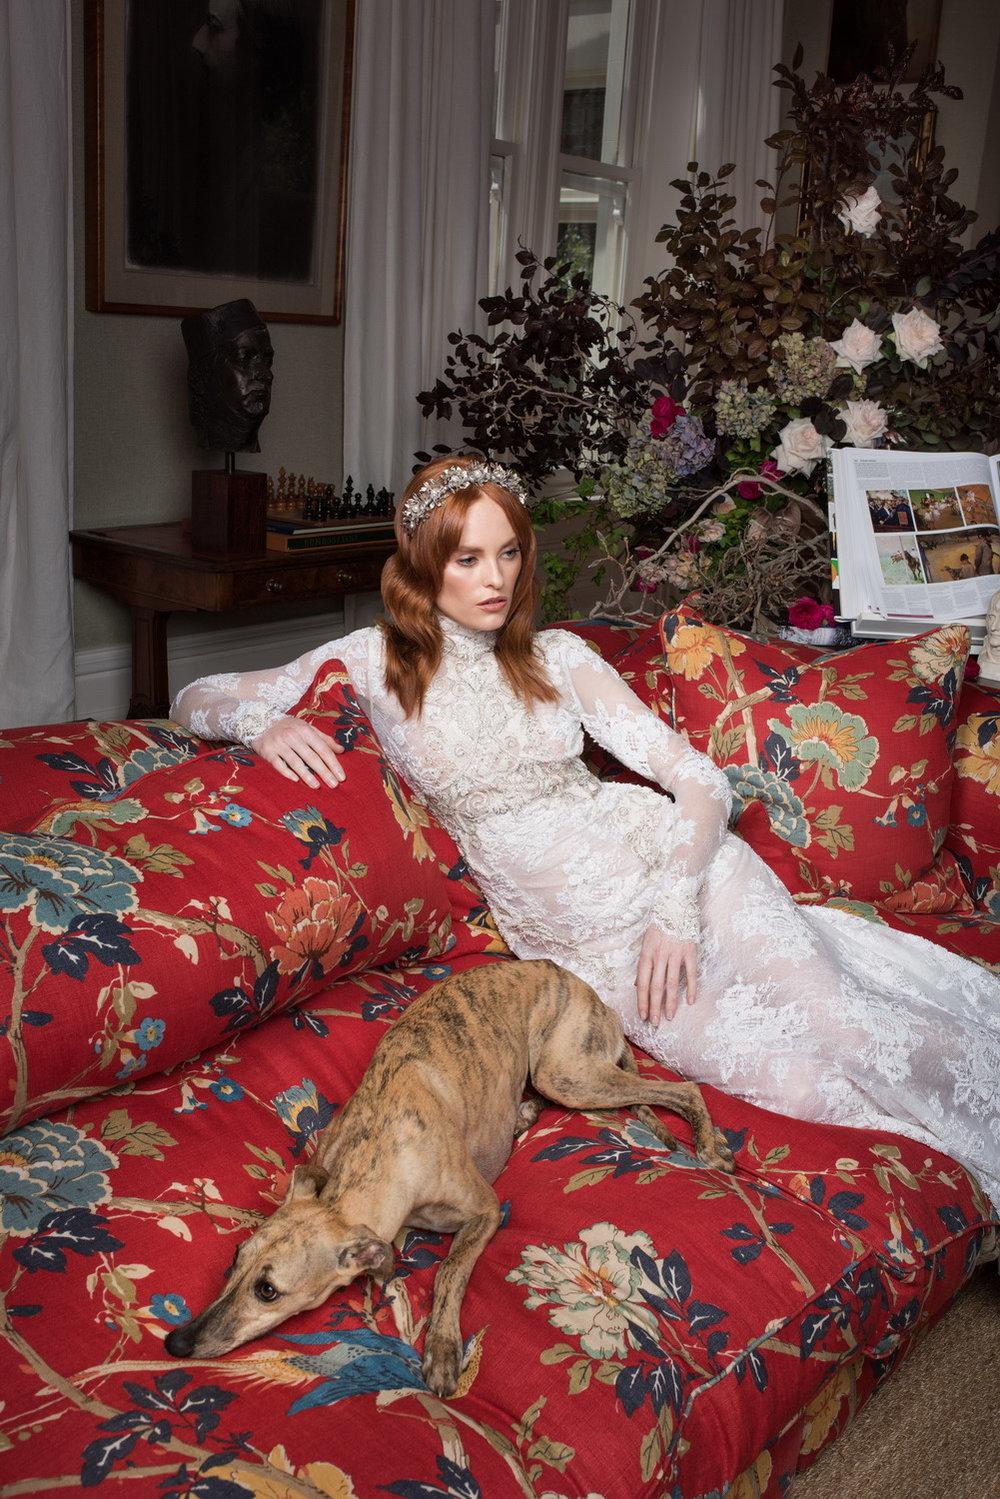 Viktoria-Novak-Immortal-Renaissance-2018-shoot-Hopewood-House5-KarenWoo7.jpg